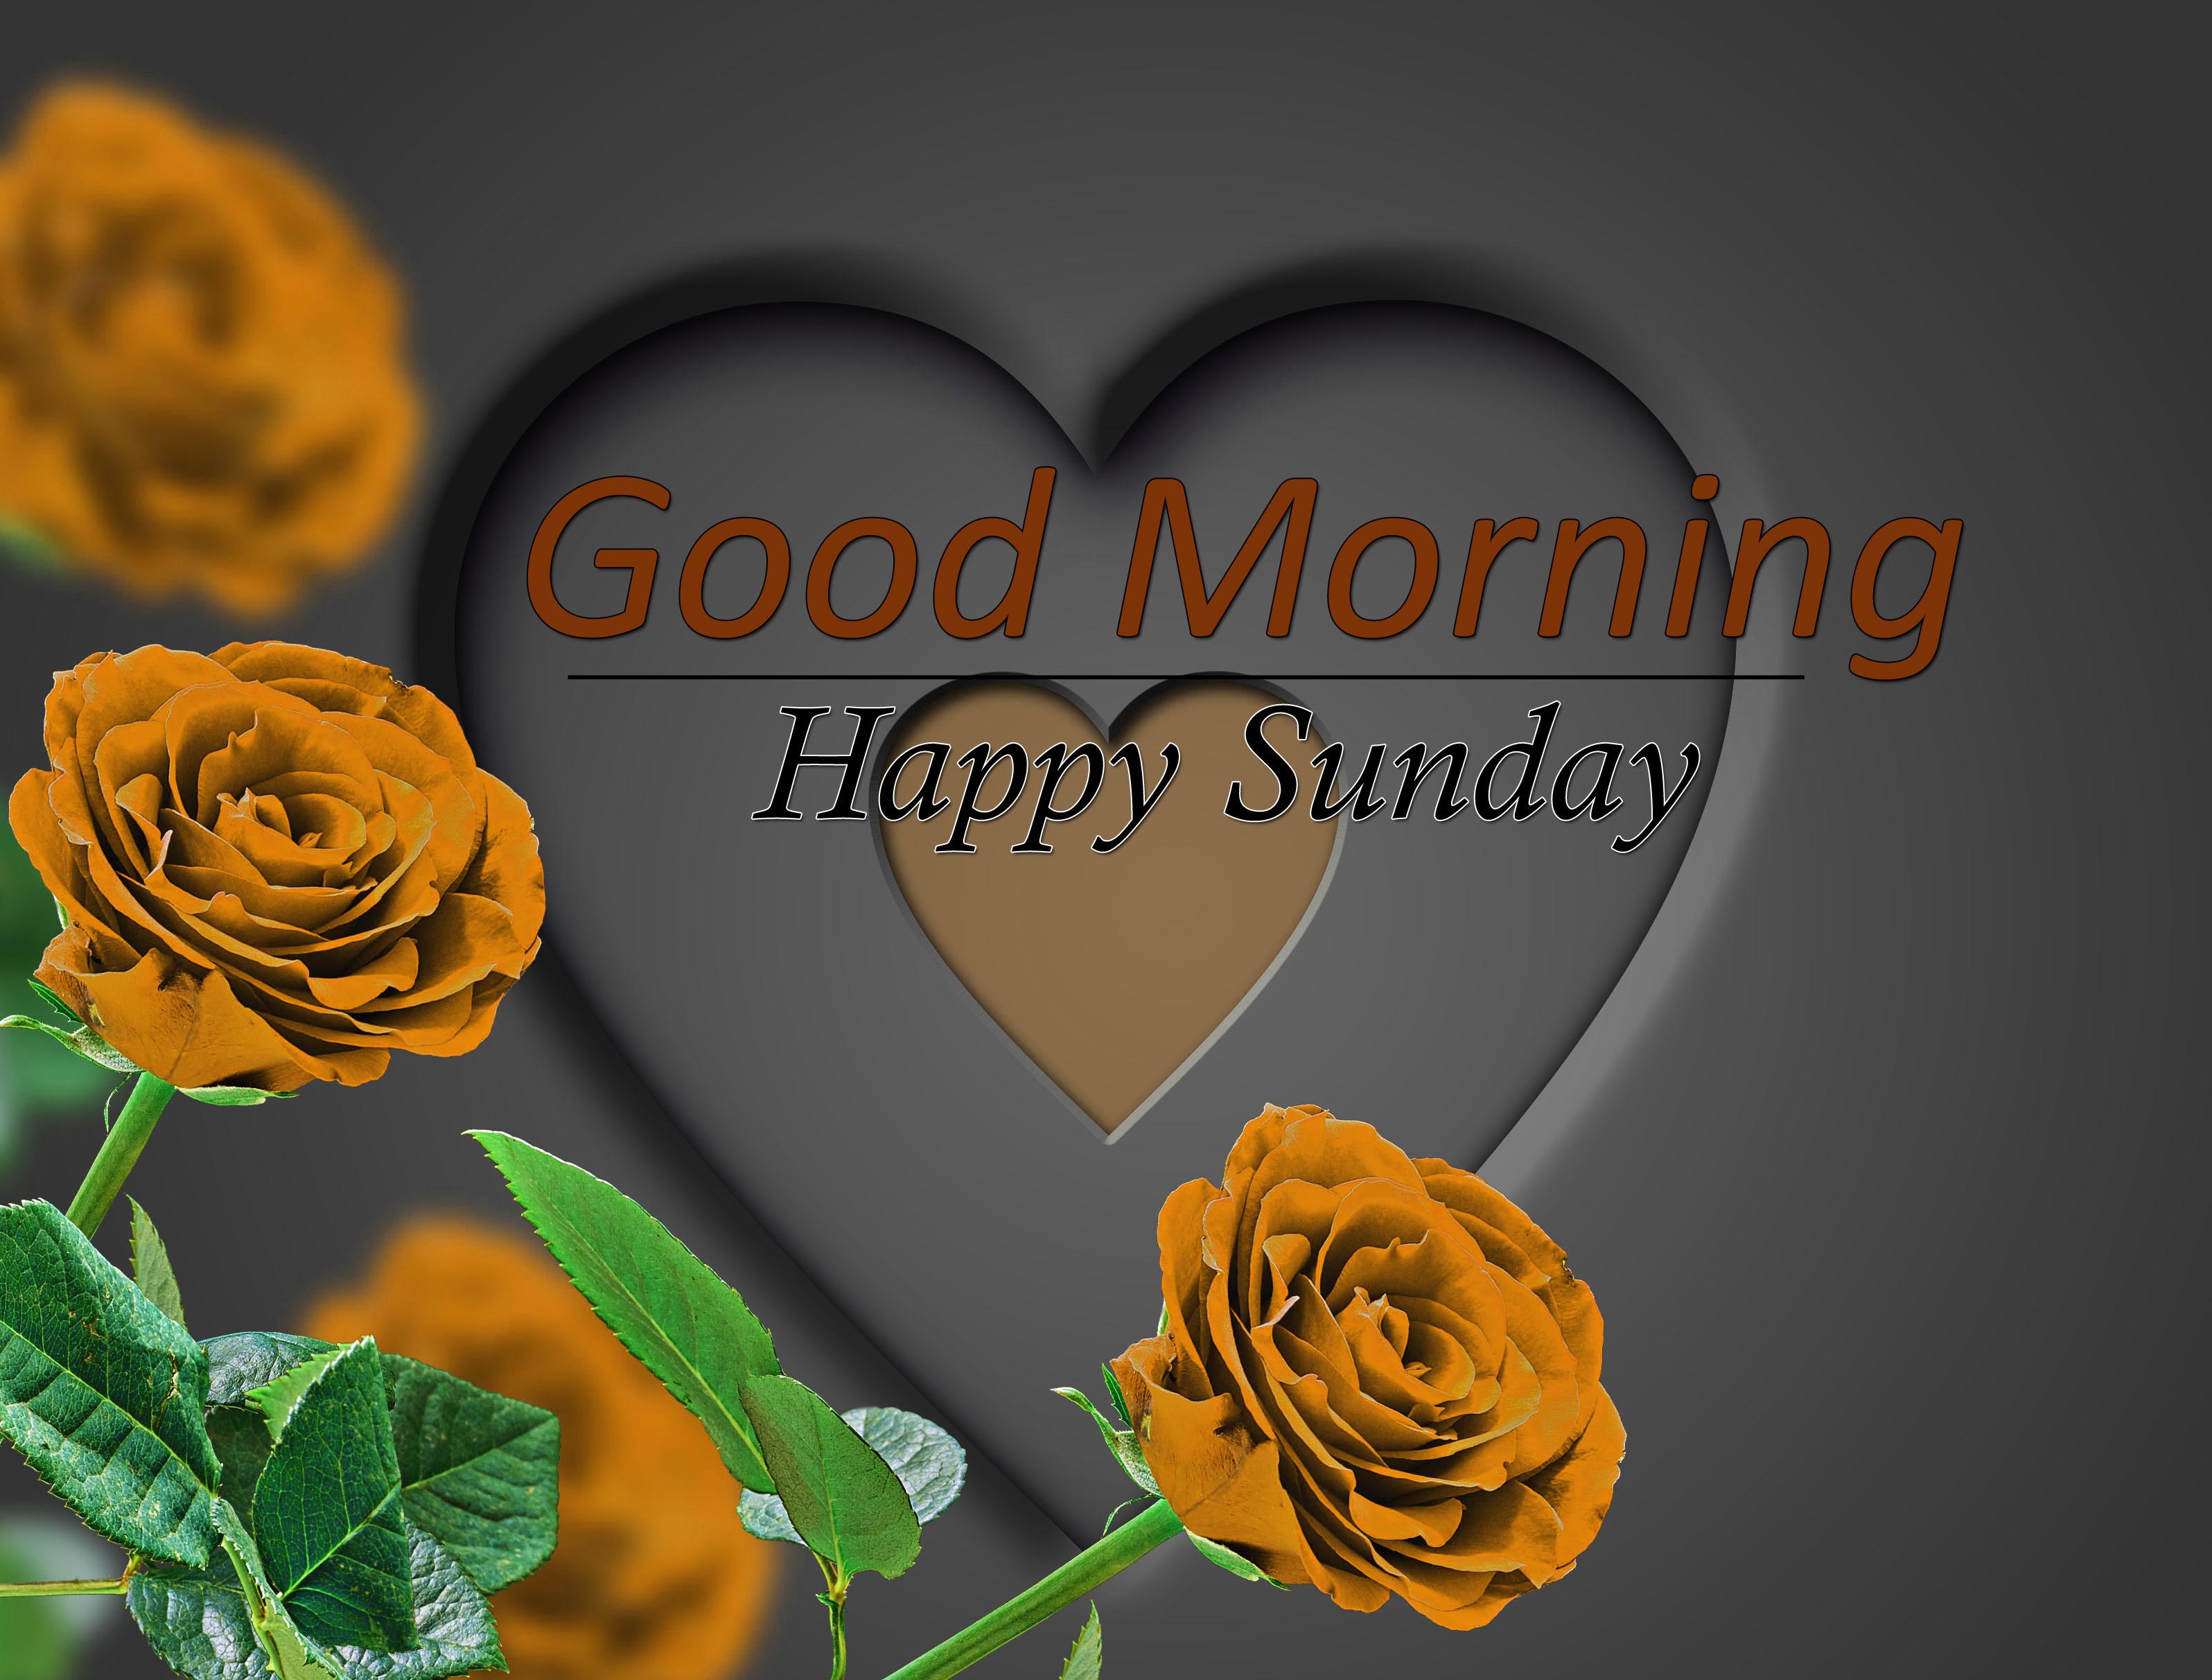 New Top Flower 4k Good Morning Images Download